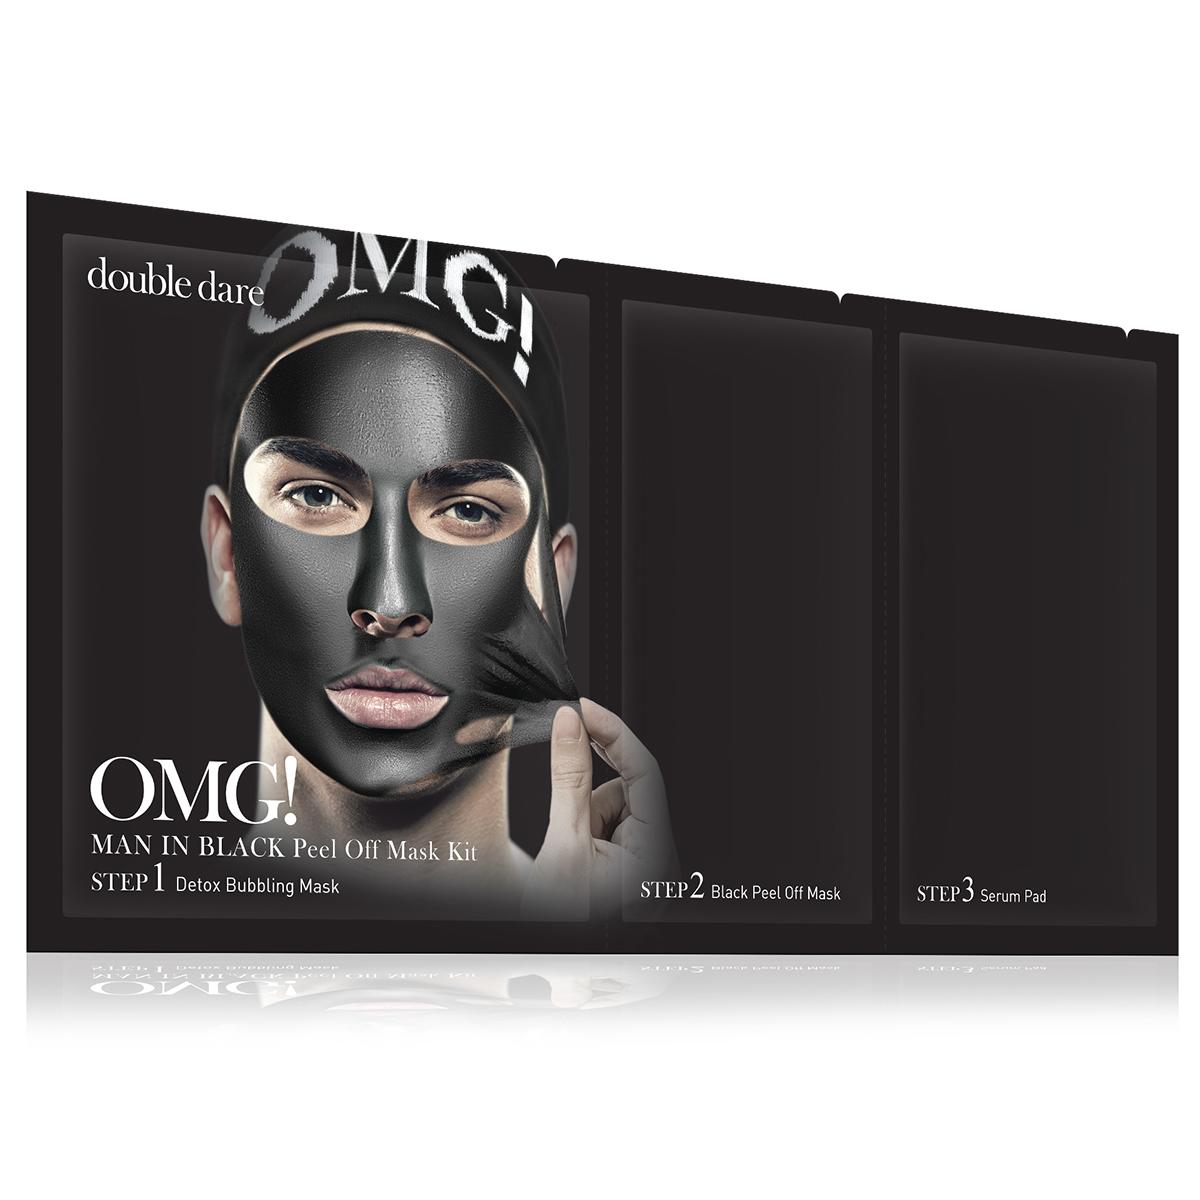 Double Dare OMG! Man In Black Peel Off Mask Kit Маска мужская трехкомпонентная для ухода за кожей лица double dare omg маска трехкомпонентная для восстановления волос 3in1 kit hair repair system